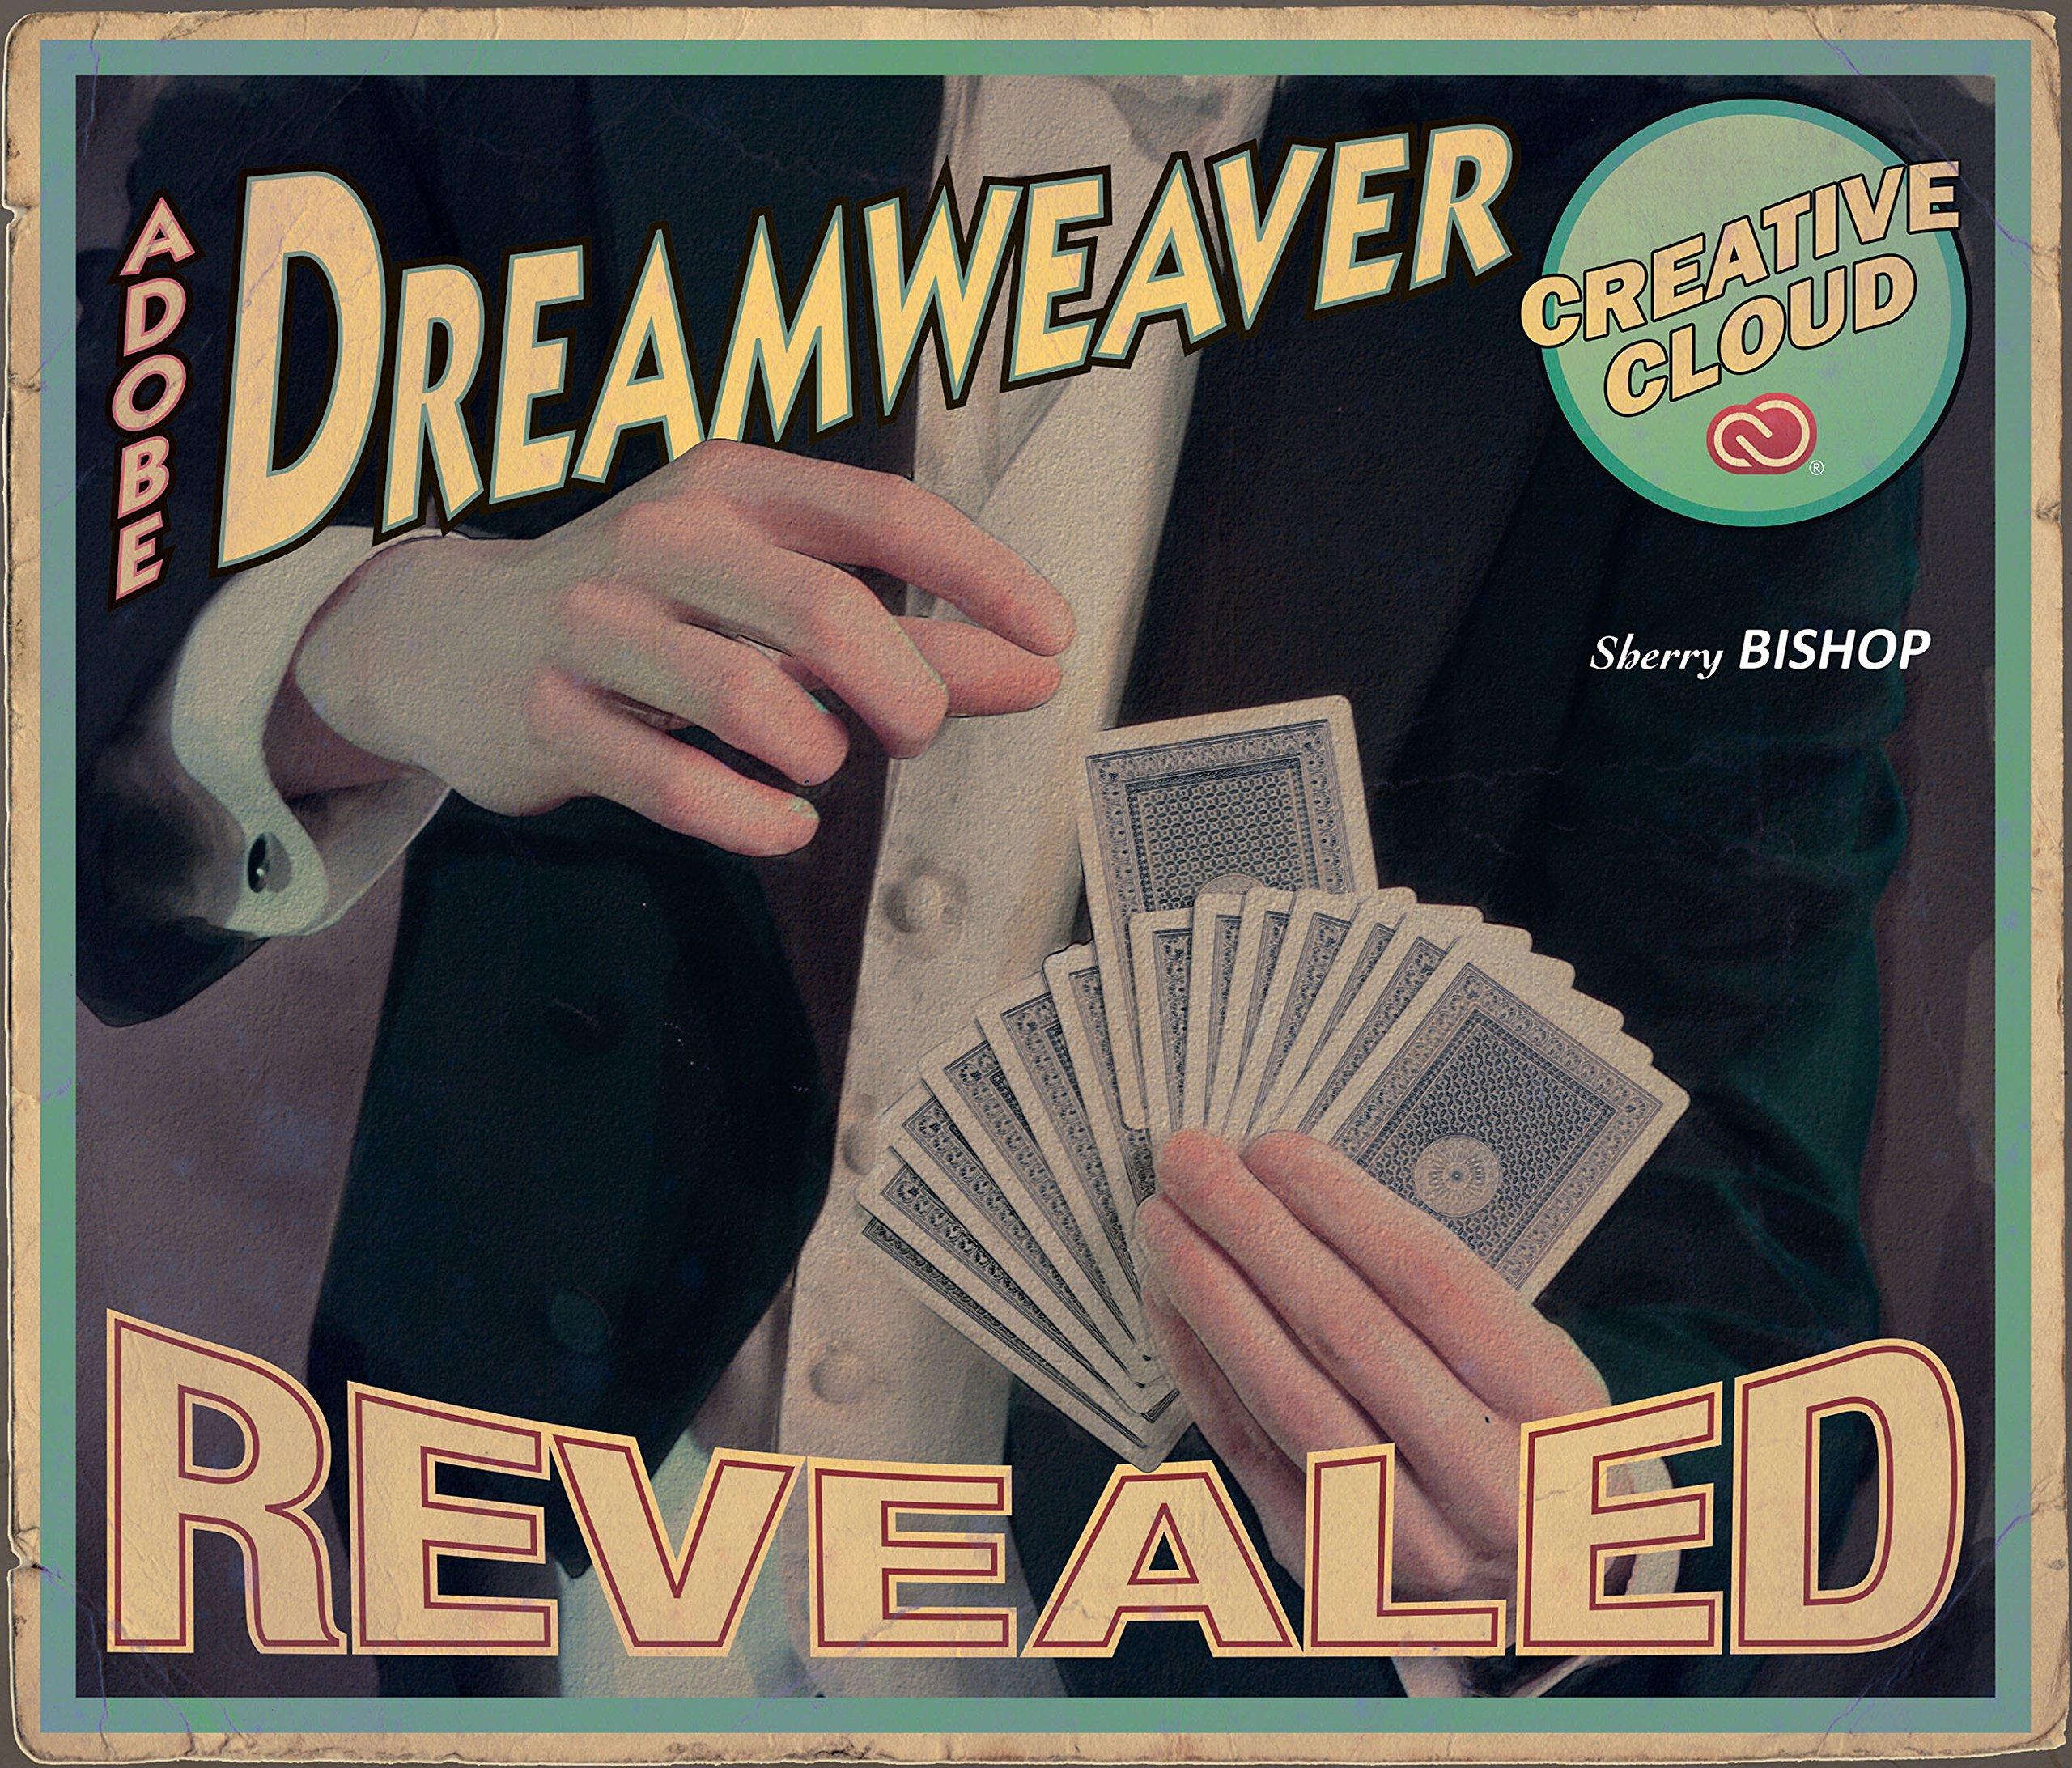 Adobe Dreamweaver Creative Cloud Revealed 001 Bishop Sherry Ebook Amazon Com